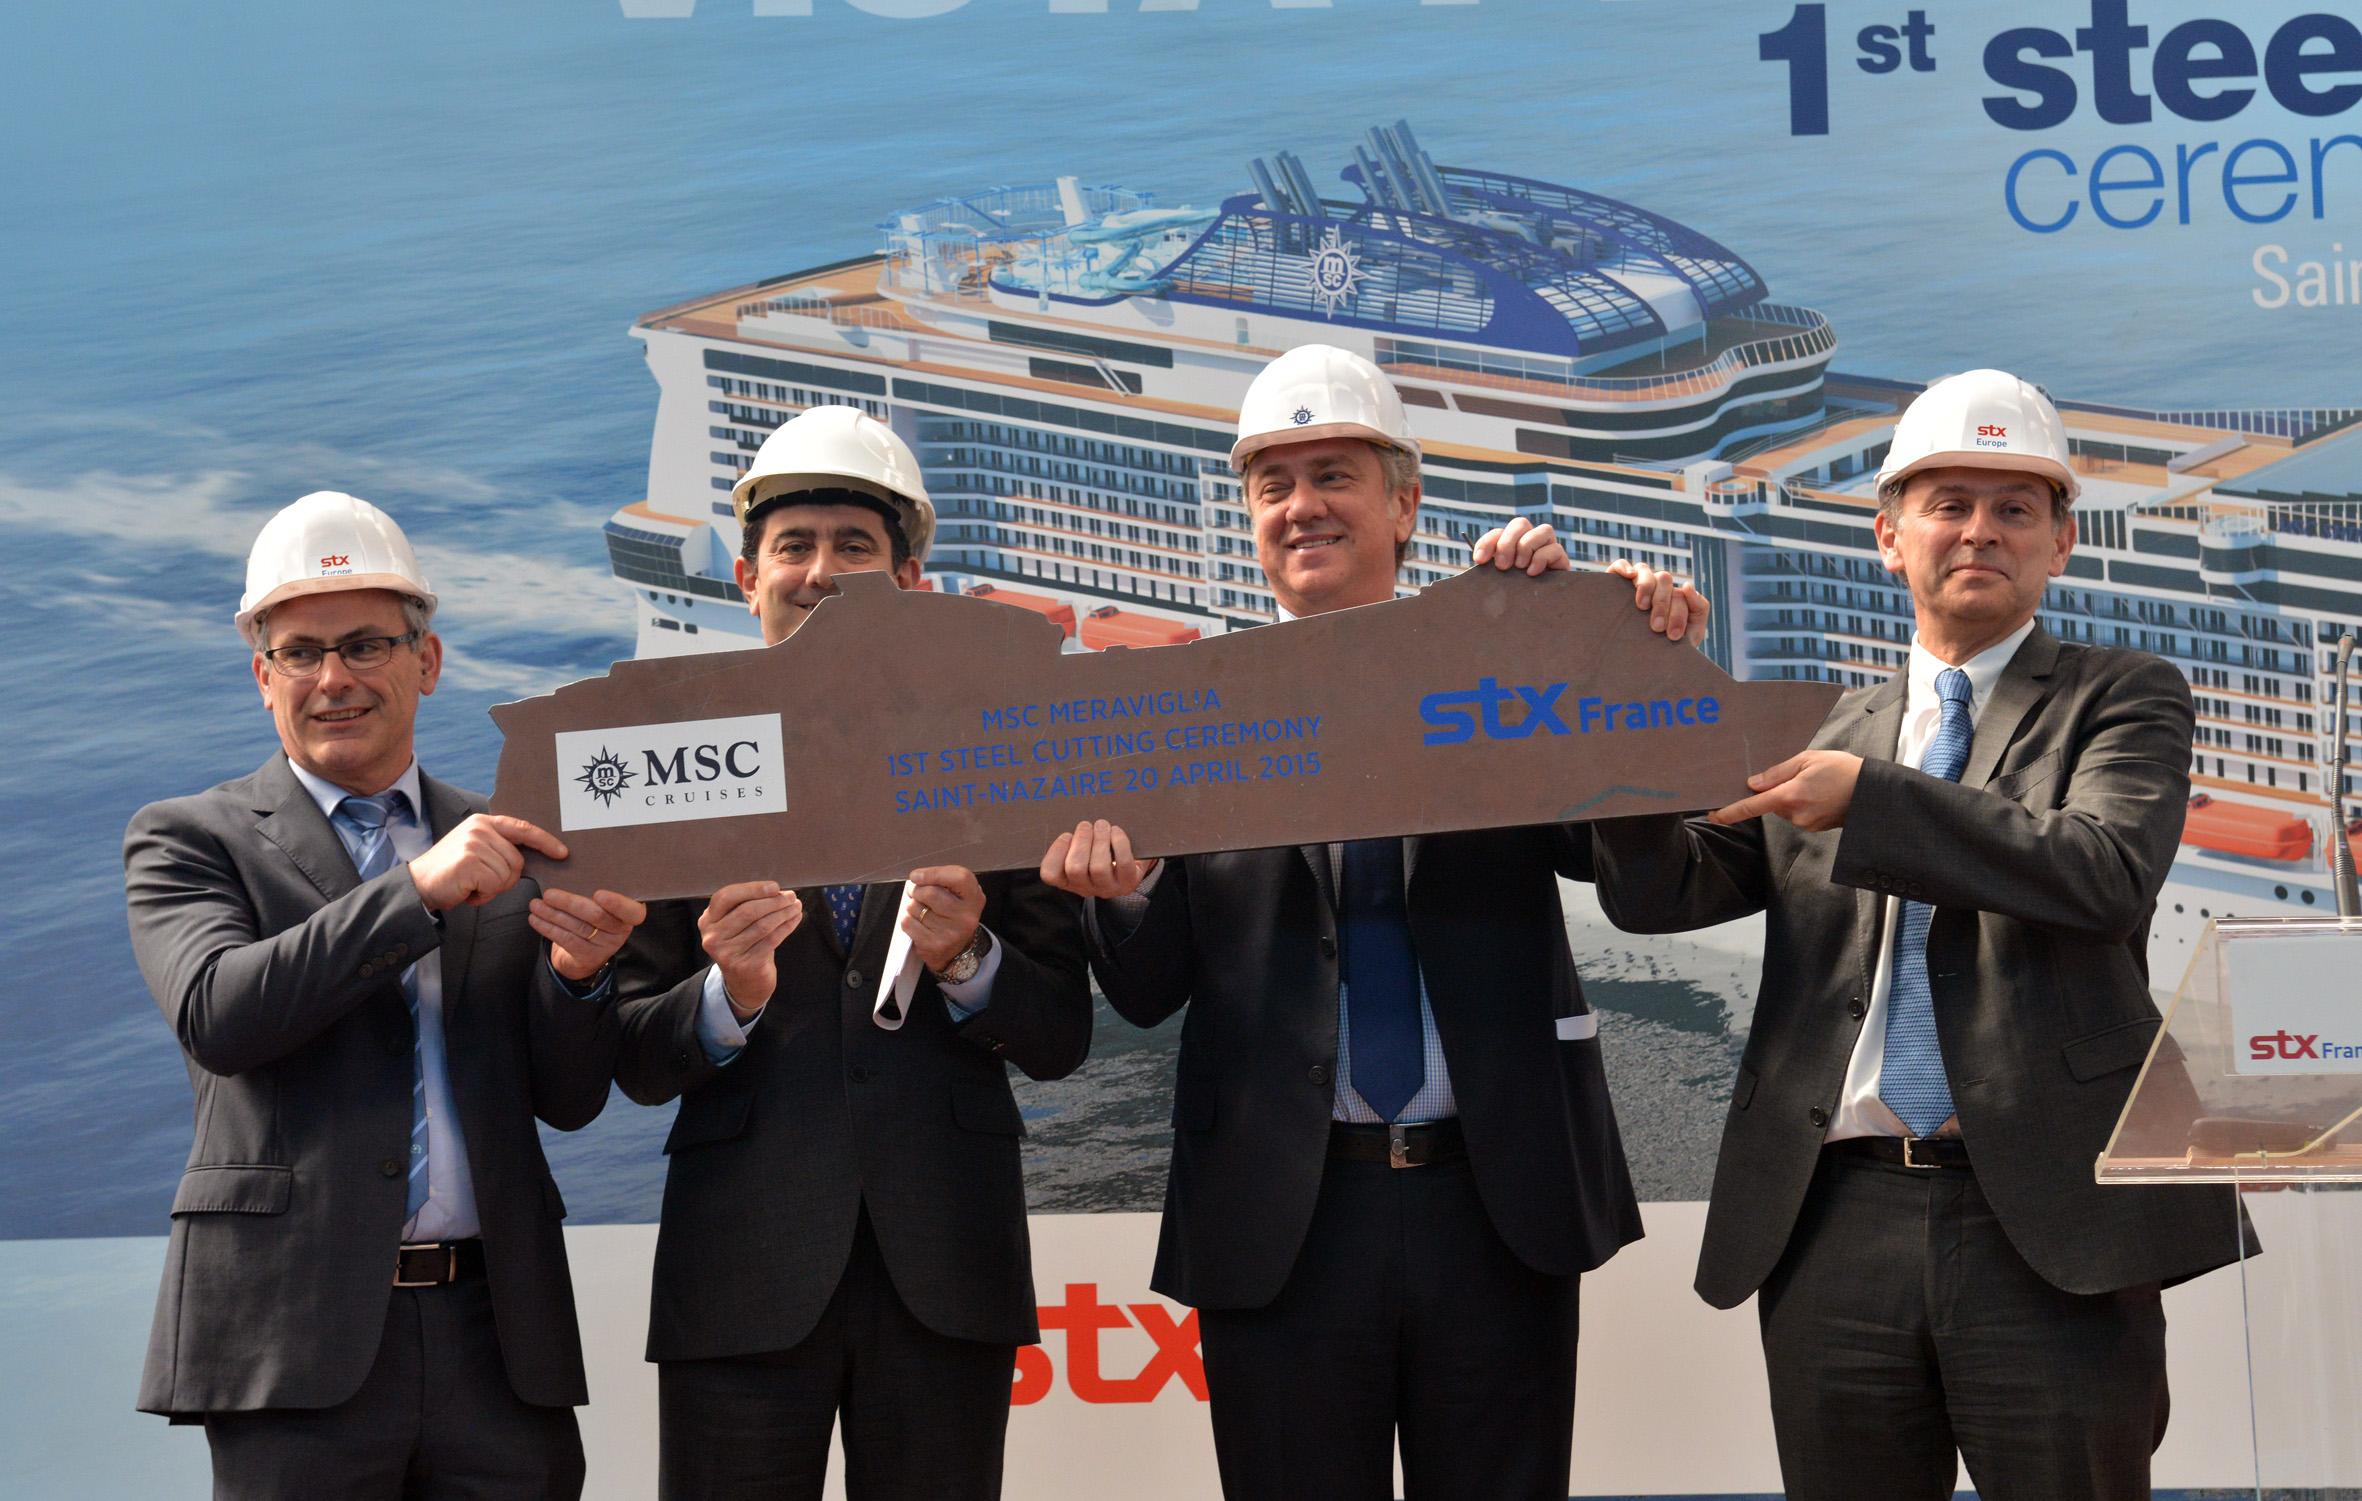 De izquierda a derecha: Jean-Yves Jaouen, Senior Vice President Operations STX France/ Gianni Onorato,  Consejero Delegado de MSC Cruceros/ Pierfrancesco Vago,  Presidente Ejecutivo de  MSC Cruceros/ Laurent Castaing STX France General Manager